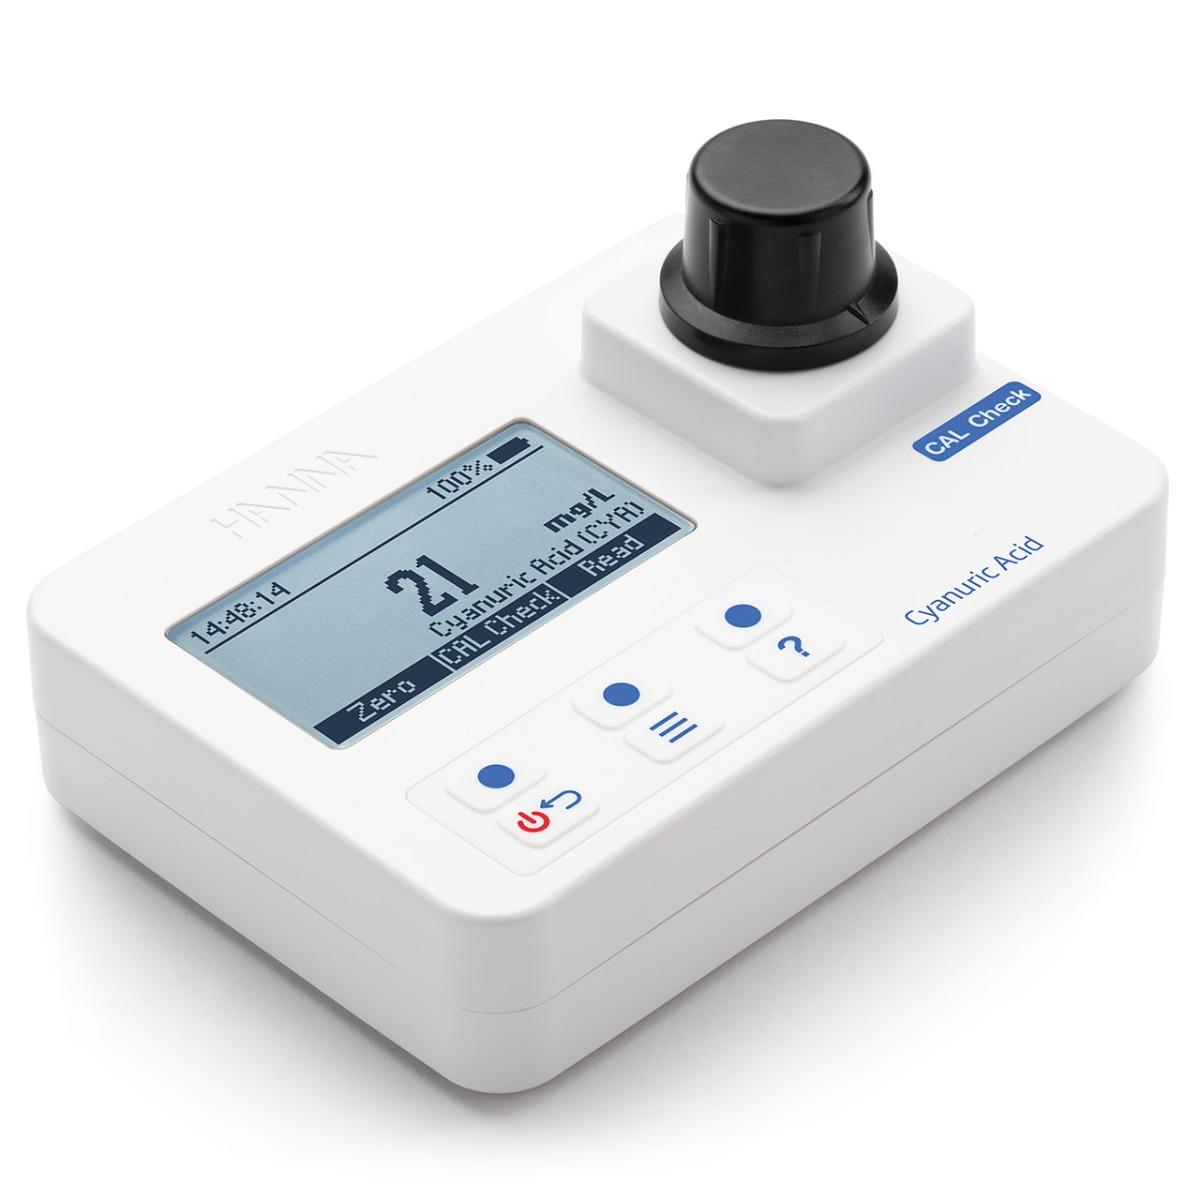 HI97722 Cyanuric Acid Portable Photometer with CAL Check